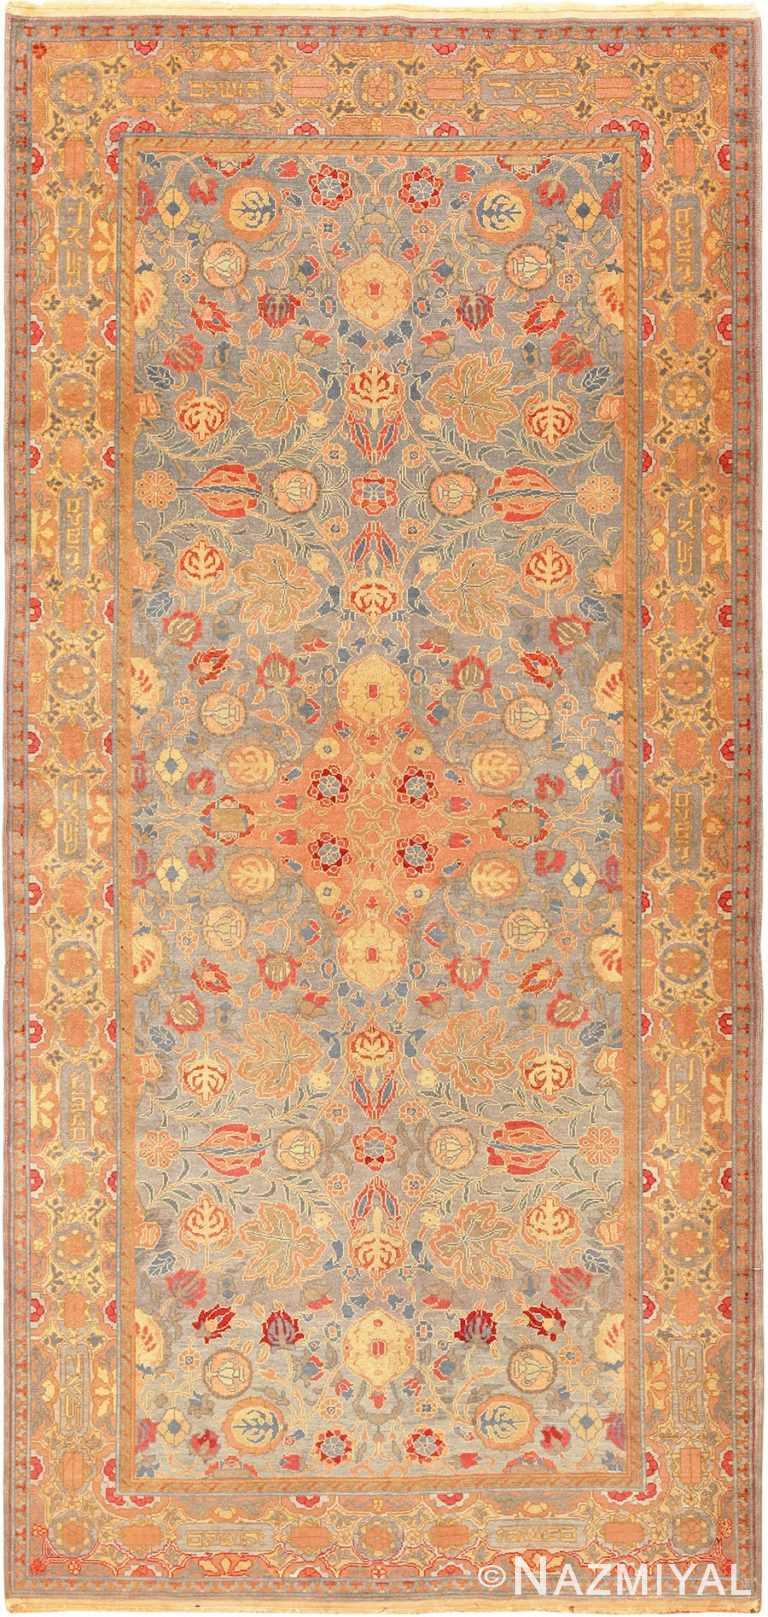 Full view antique Israeli Bezalel rug 70176 by Nazmiyal